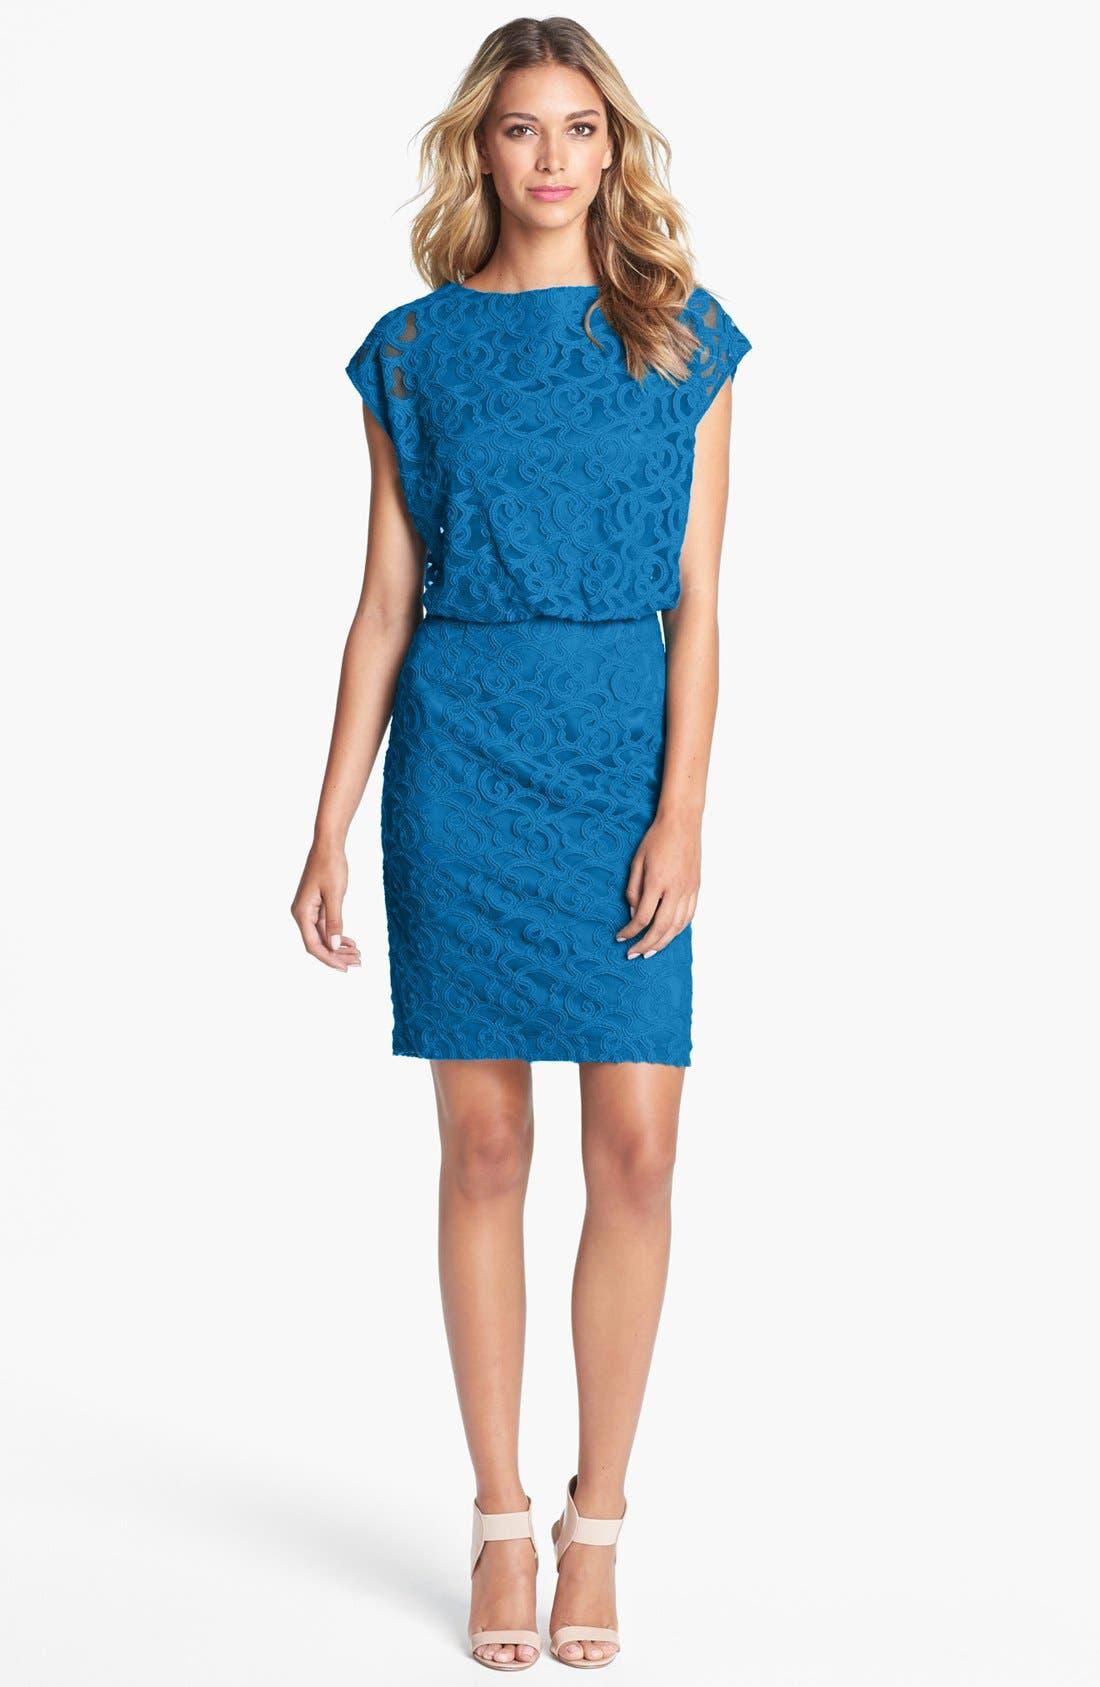 Alternate Image 1 Selected - Adrianna Papell Lace Blouson Dress (Petite)